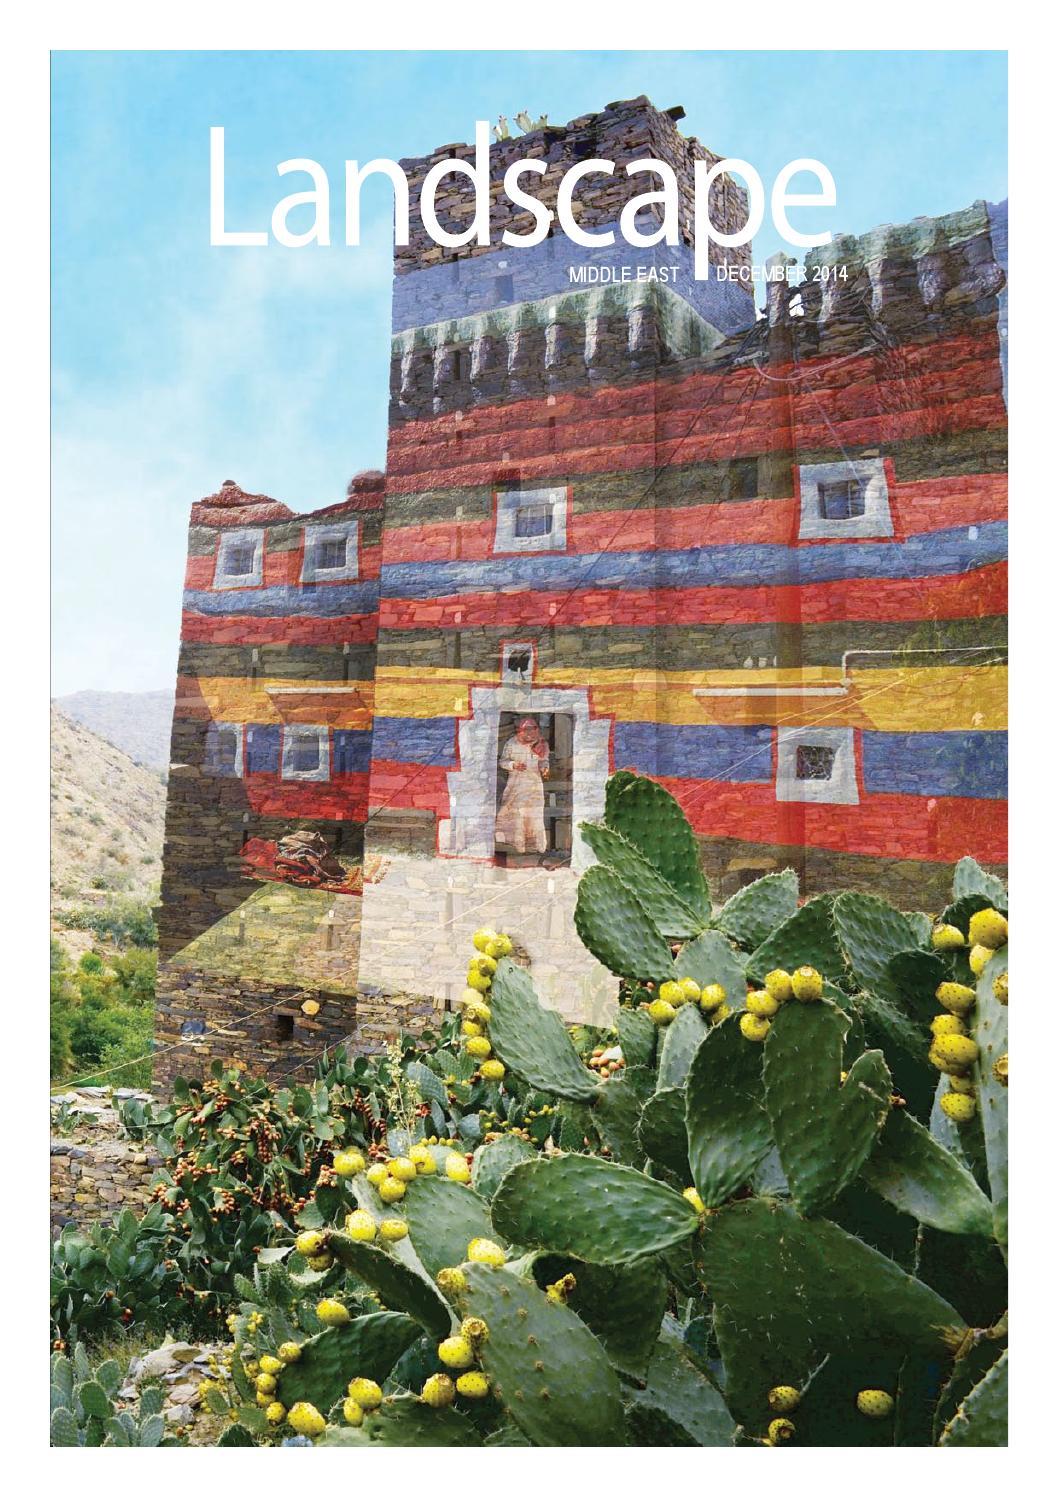 Landscape Magazine December 2014 By Allan Castro Issuu